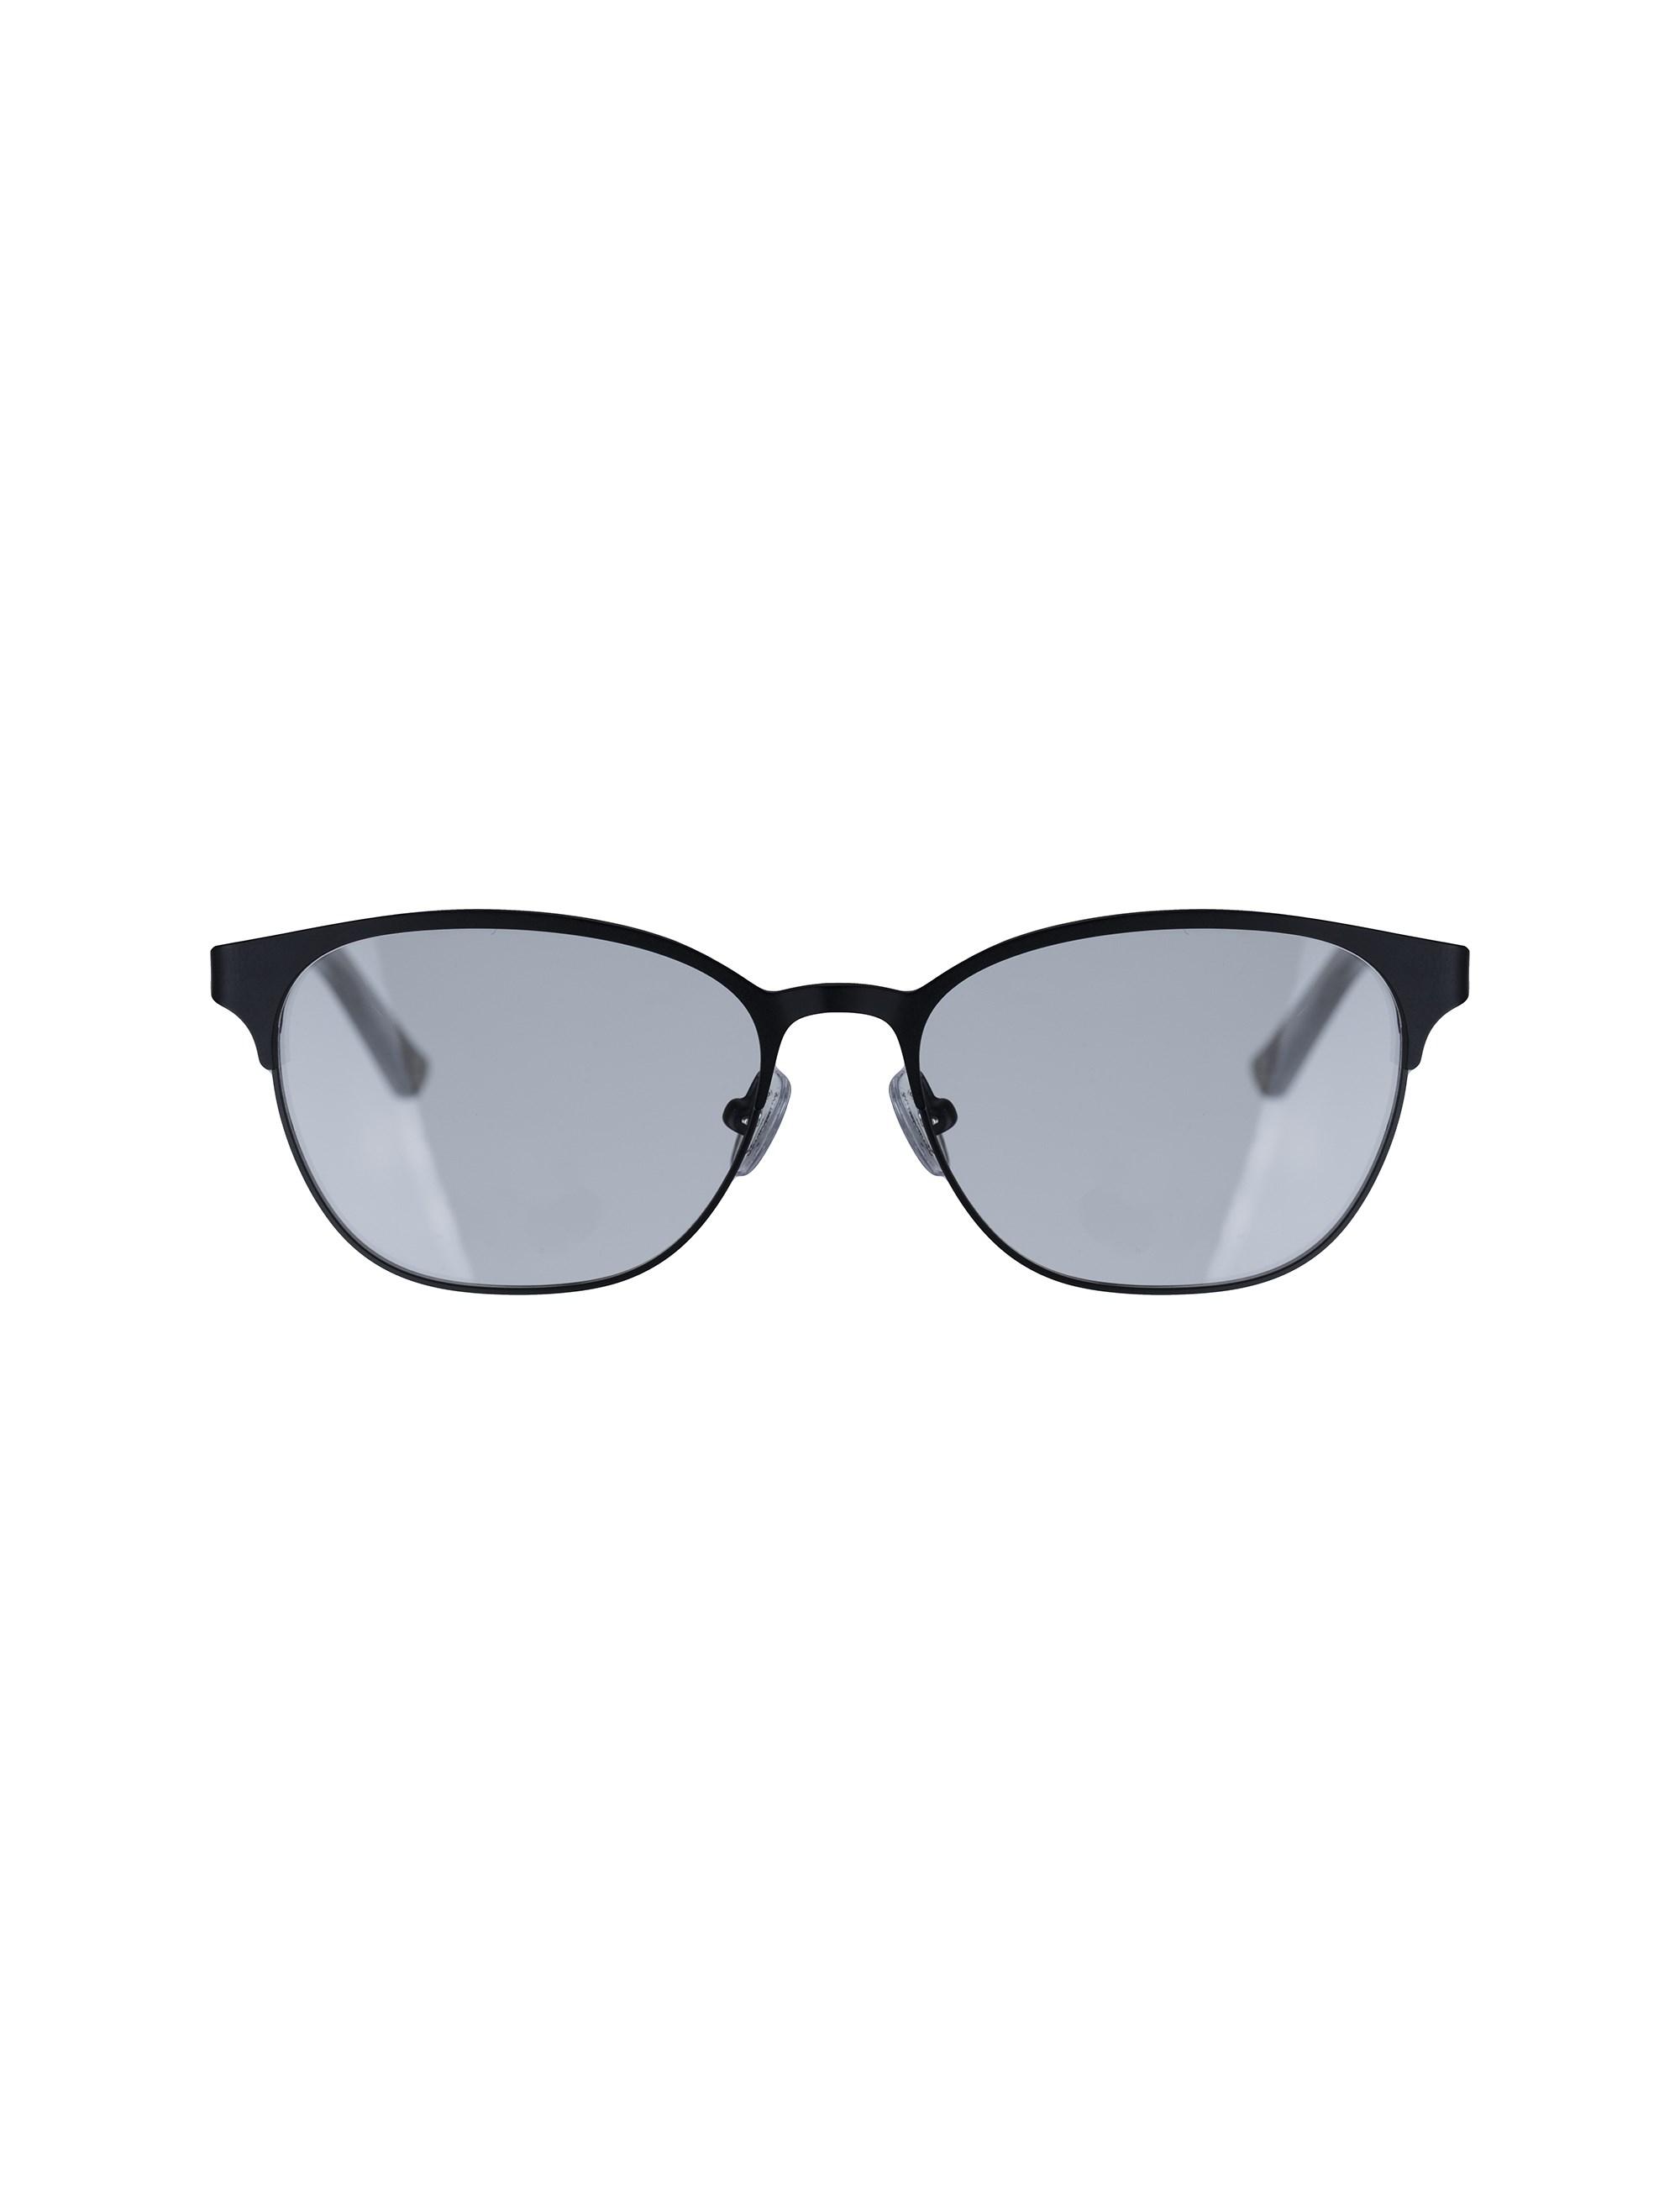 عینک طبی ویفرر زنانه - پپه جینز